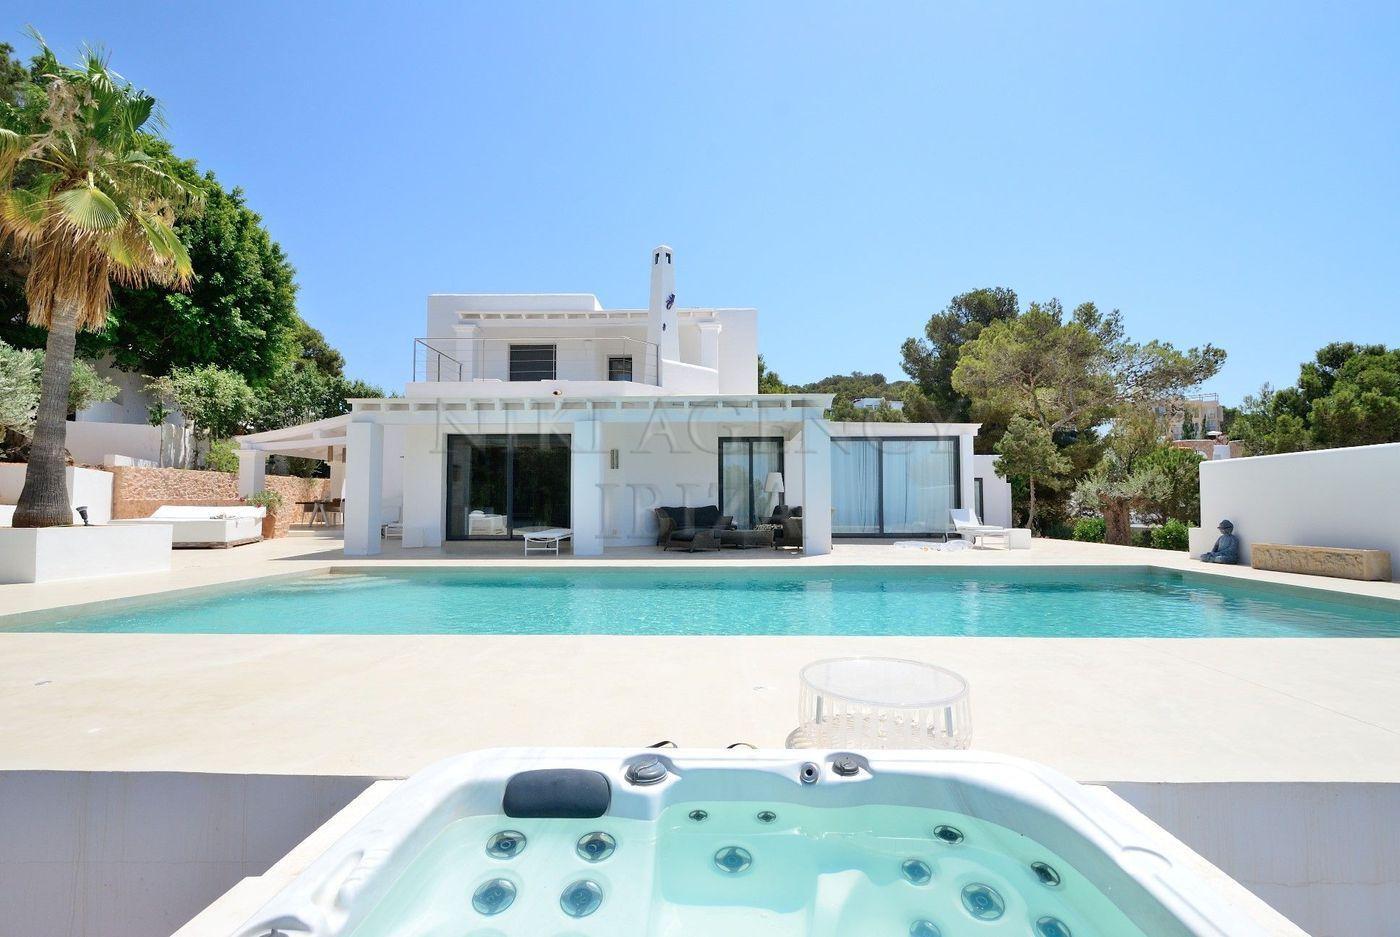 2. House for sale in Sant Josep de sa Talaia Ibiza - Fantastic 4 Bed Villa For Sale in Sant Josep de sa Talaia, Ibiza!